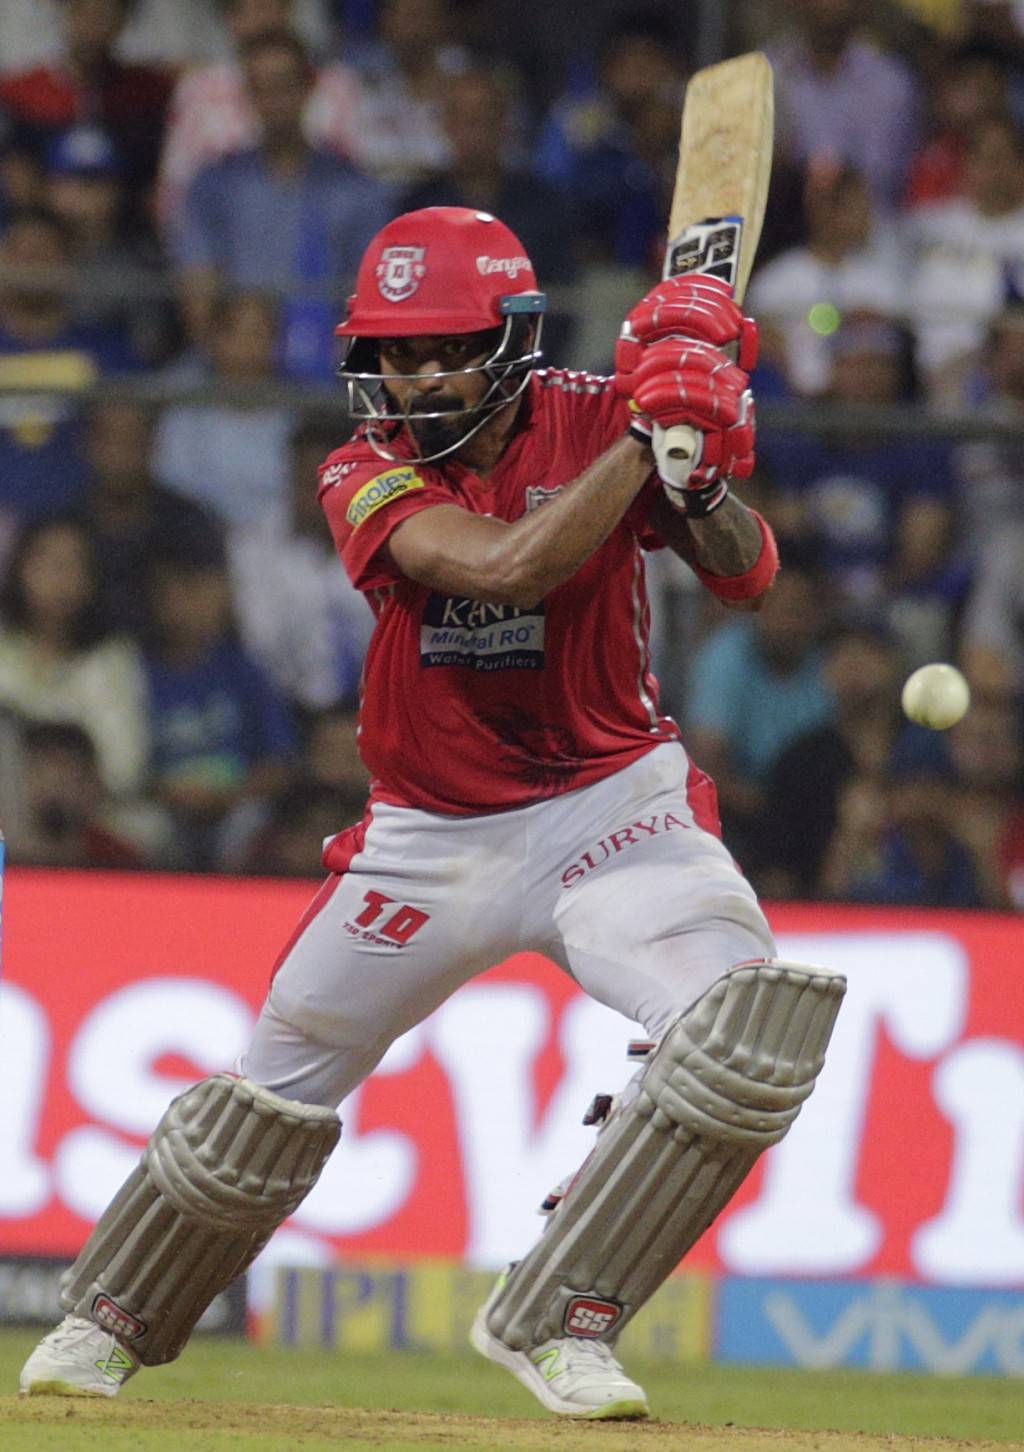 Kings XI Punjab's K.L.Rahul bats during the VIVO IPL cricket T20 match against the Mumbai Indians in Mumbai, India, Wednesday, May 16, 2018 . (AP Phot